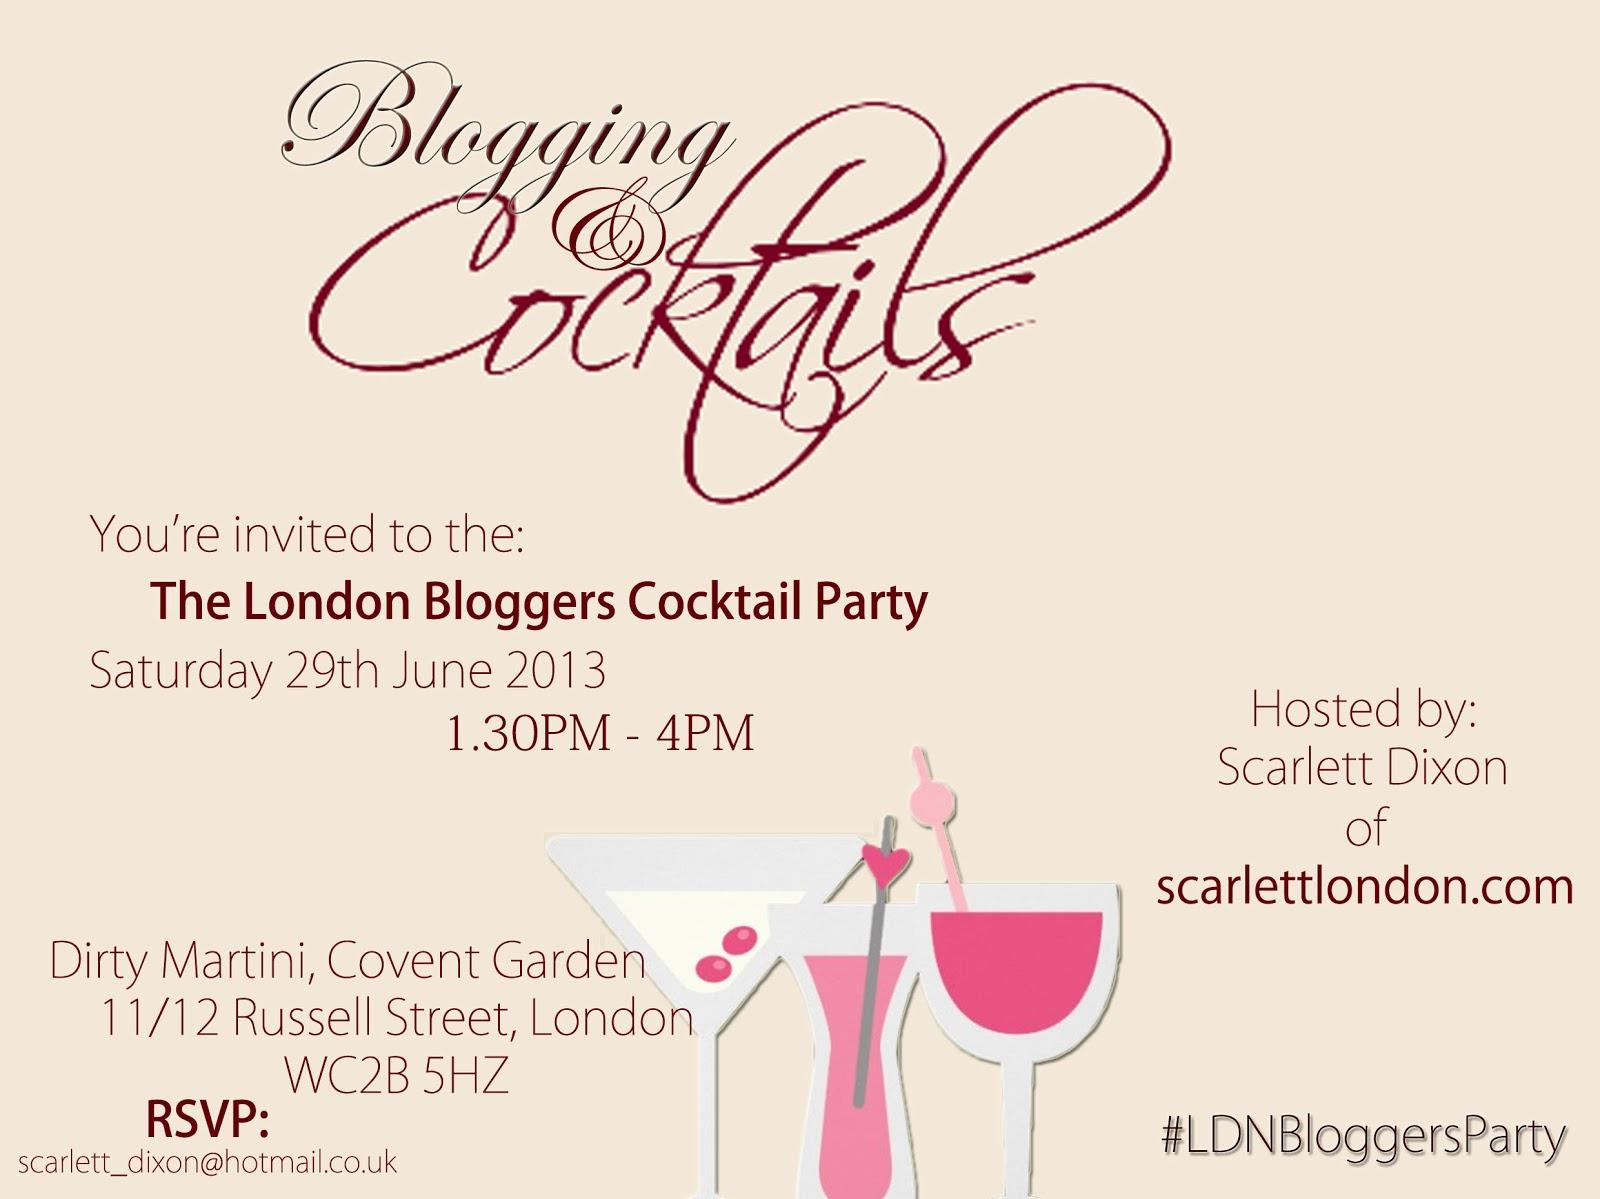 Bloggers meet invite